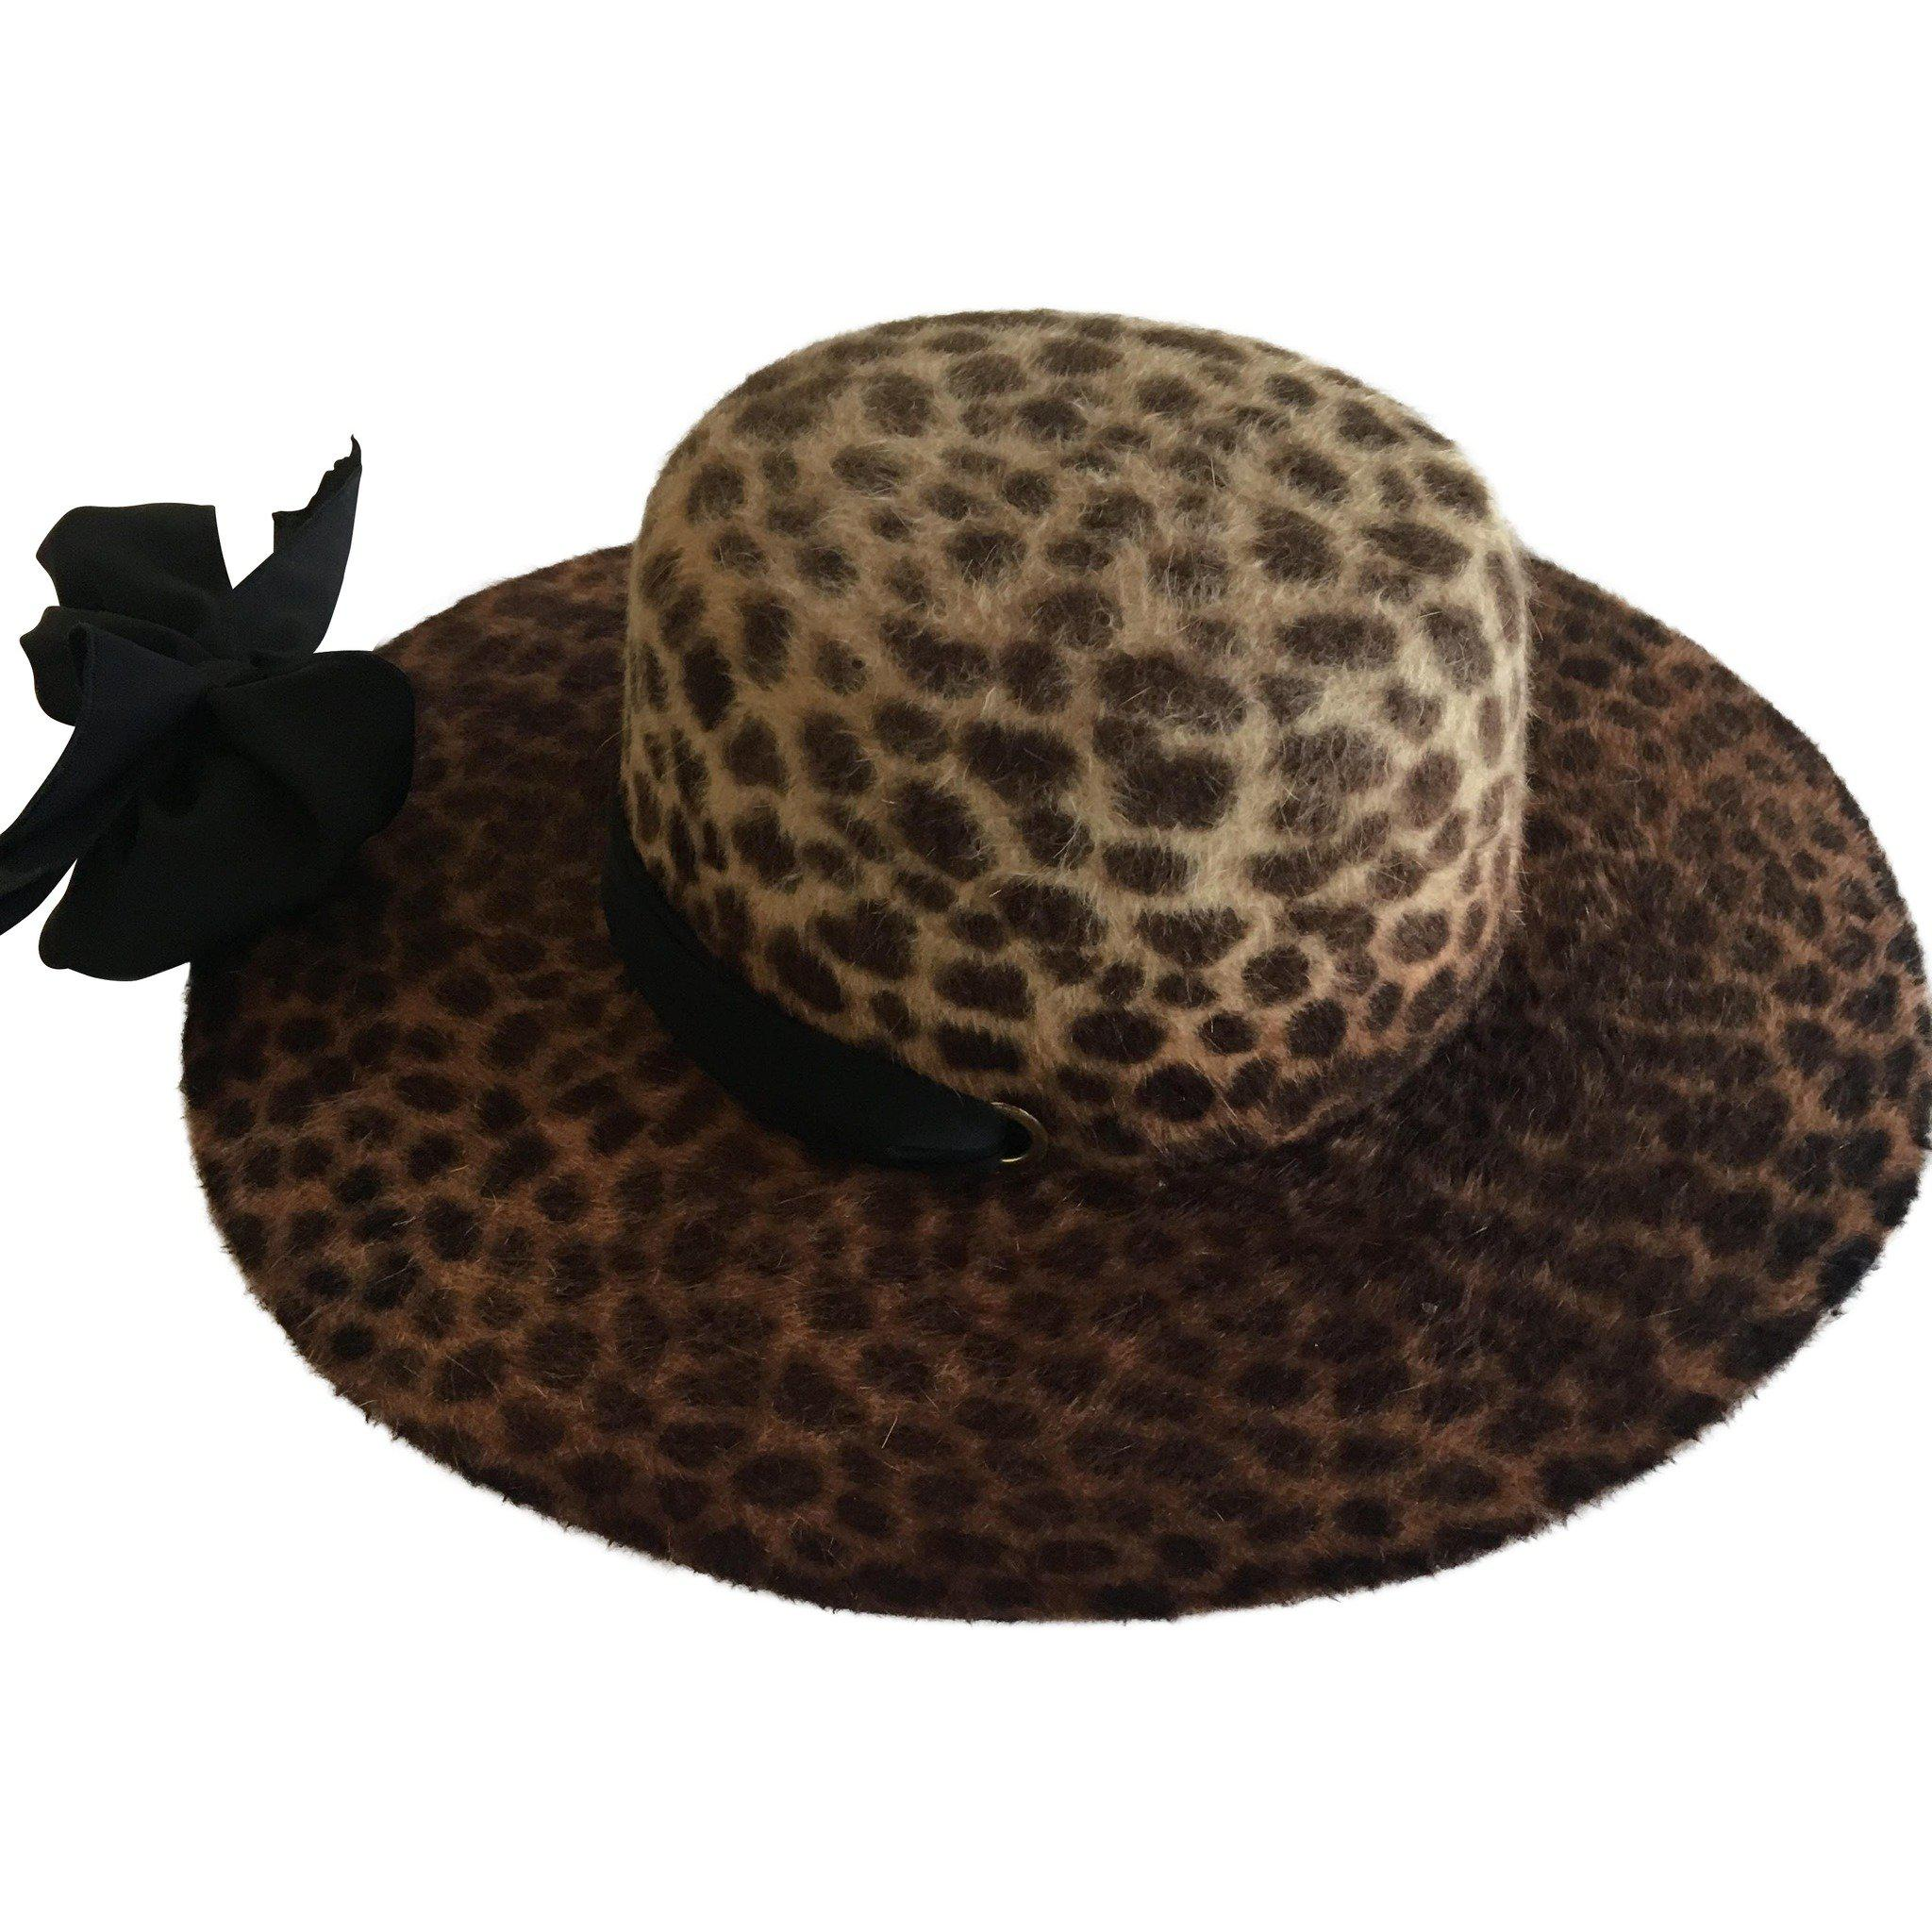 Verushka Hat Gladys Tamez Millinery w5ivbD4nR